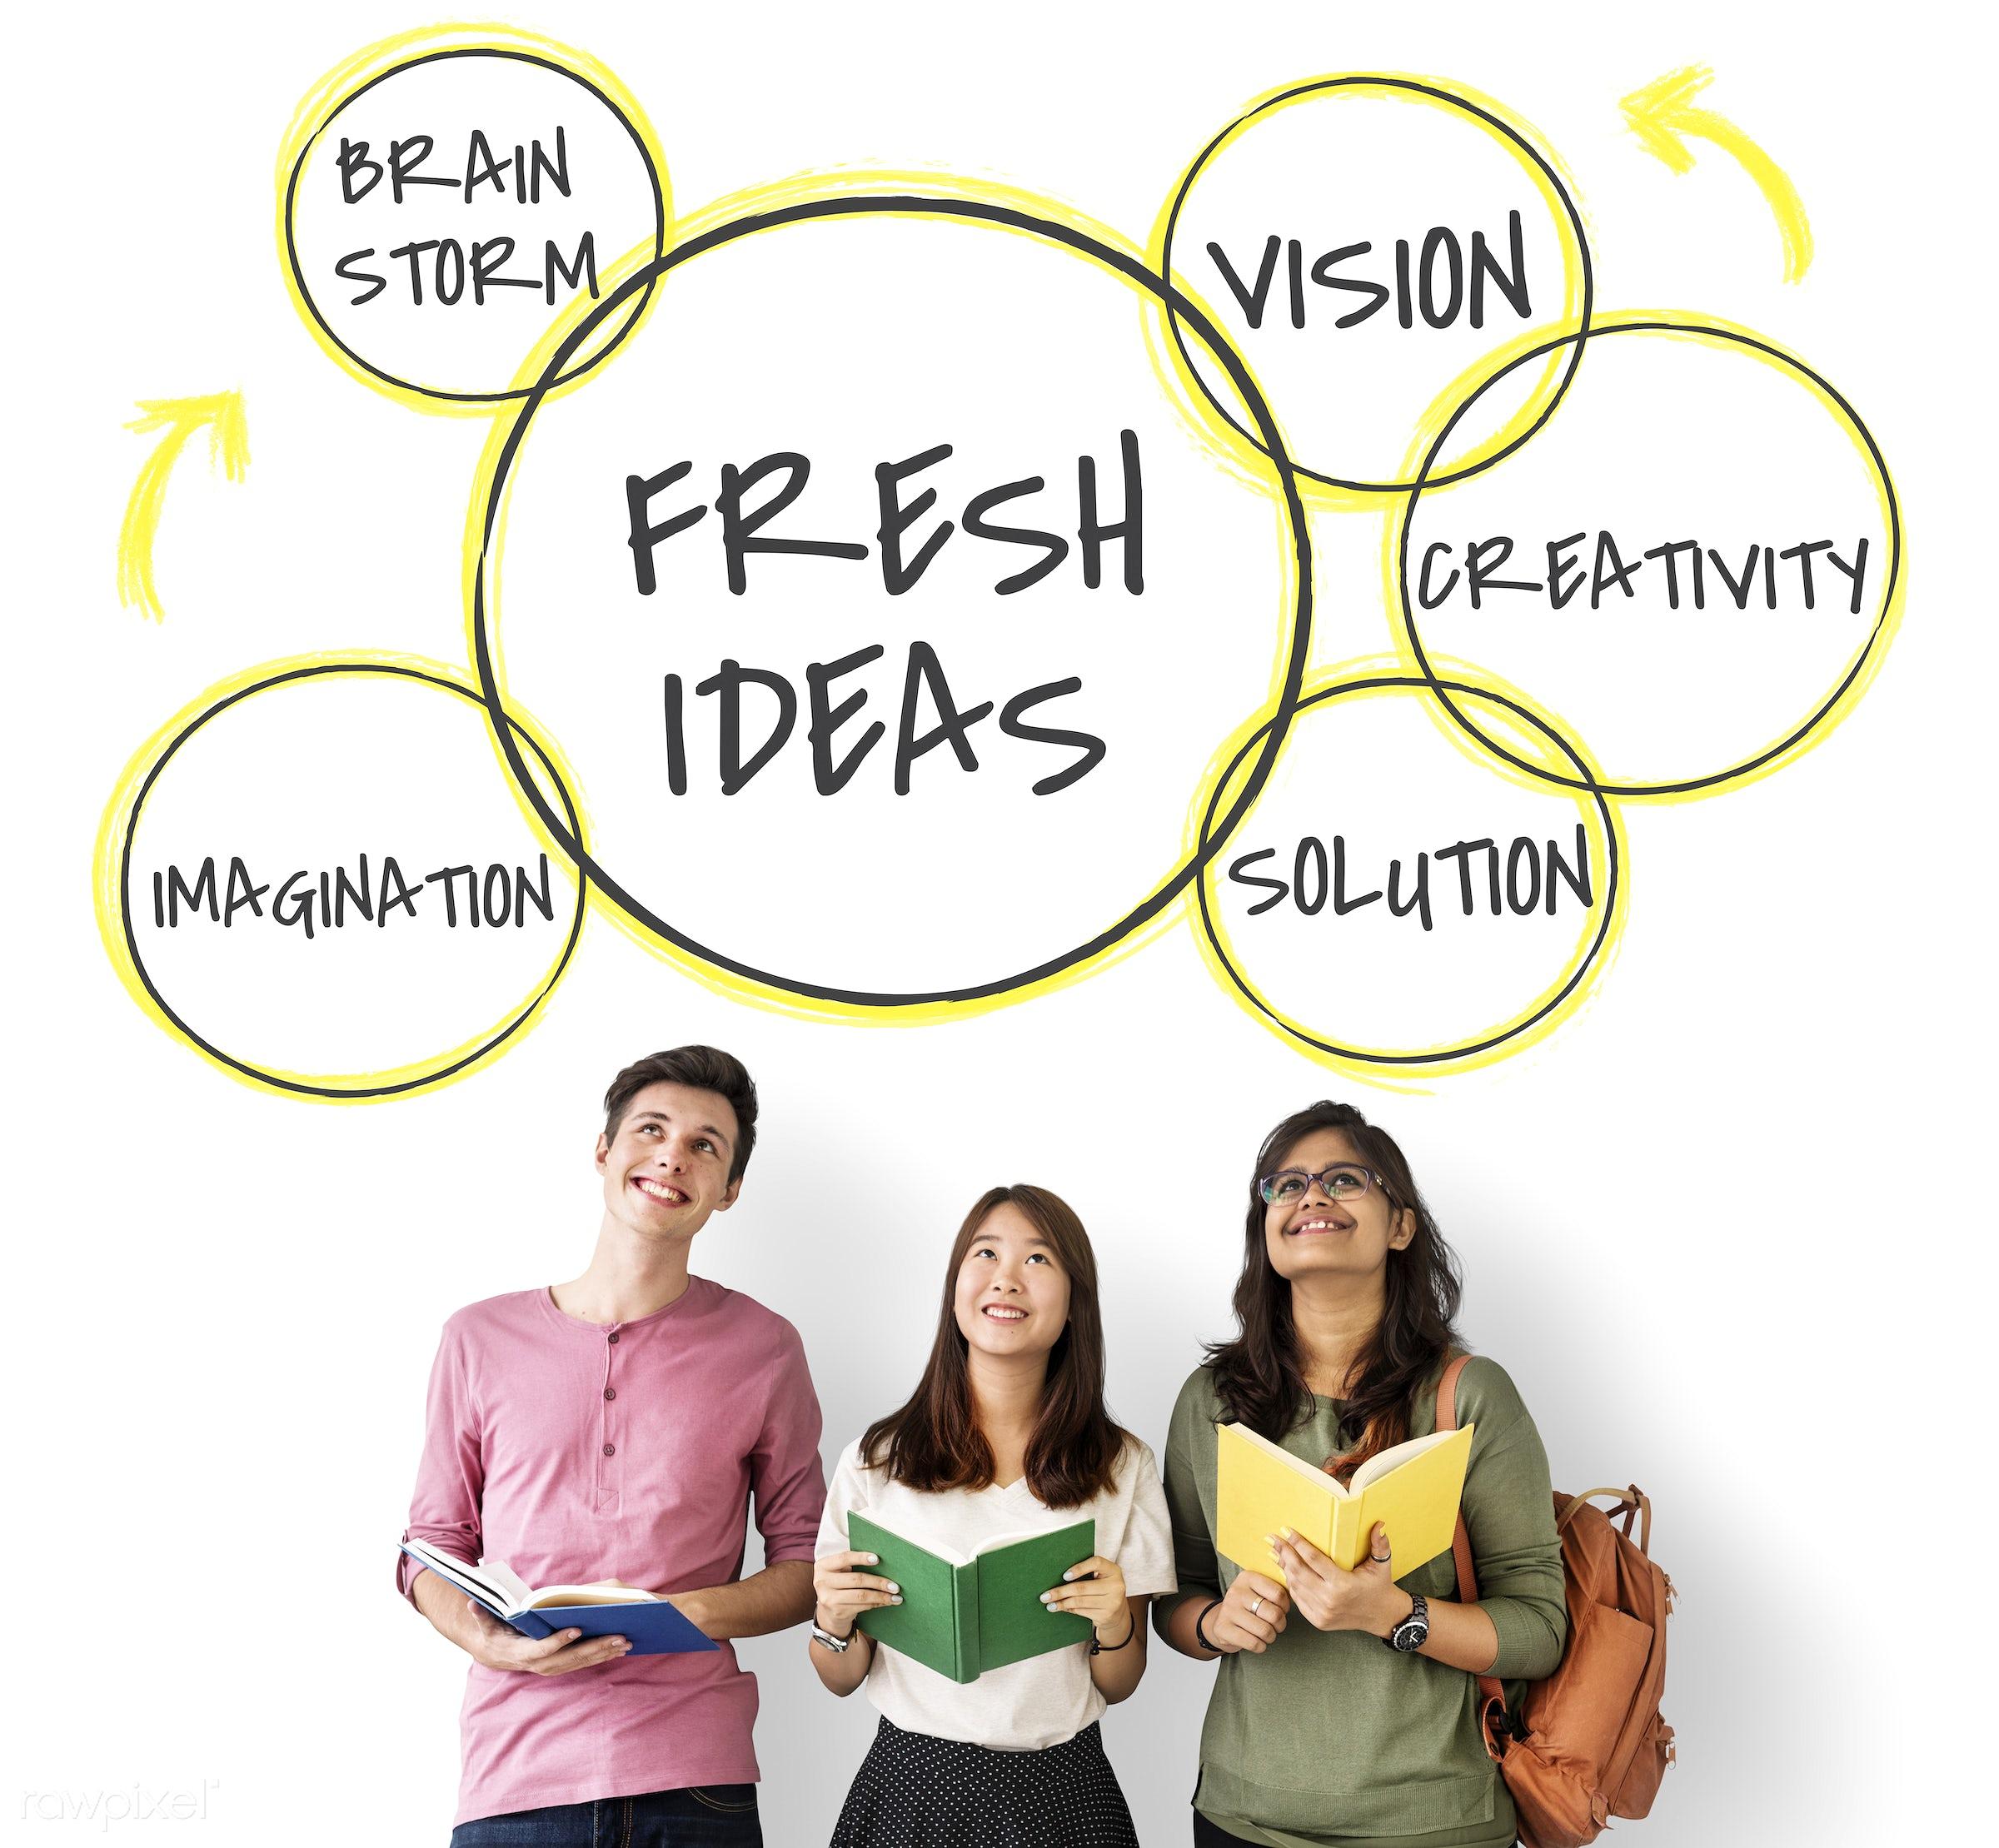 african descent, asian, book, brainstorm, business, caucasian, creative, development, diagram, diversity, enjoyment,...